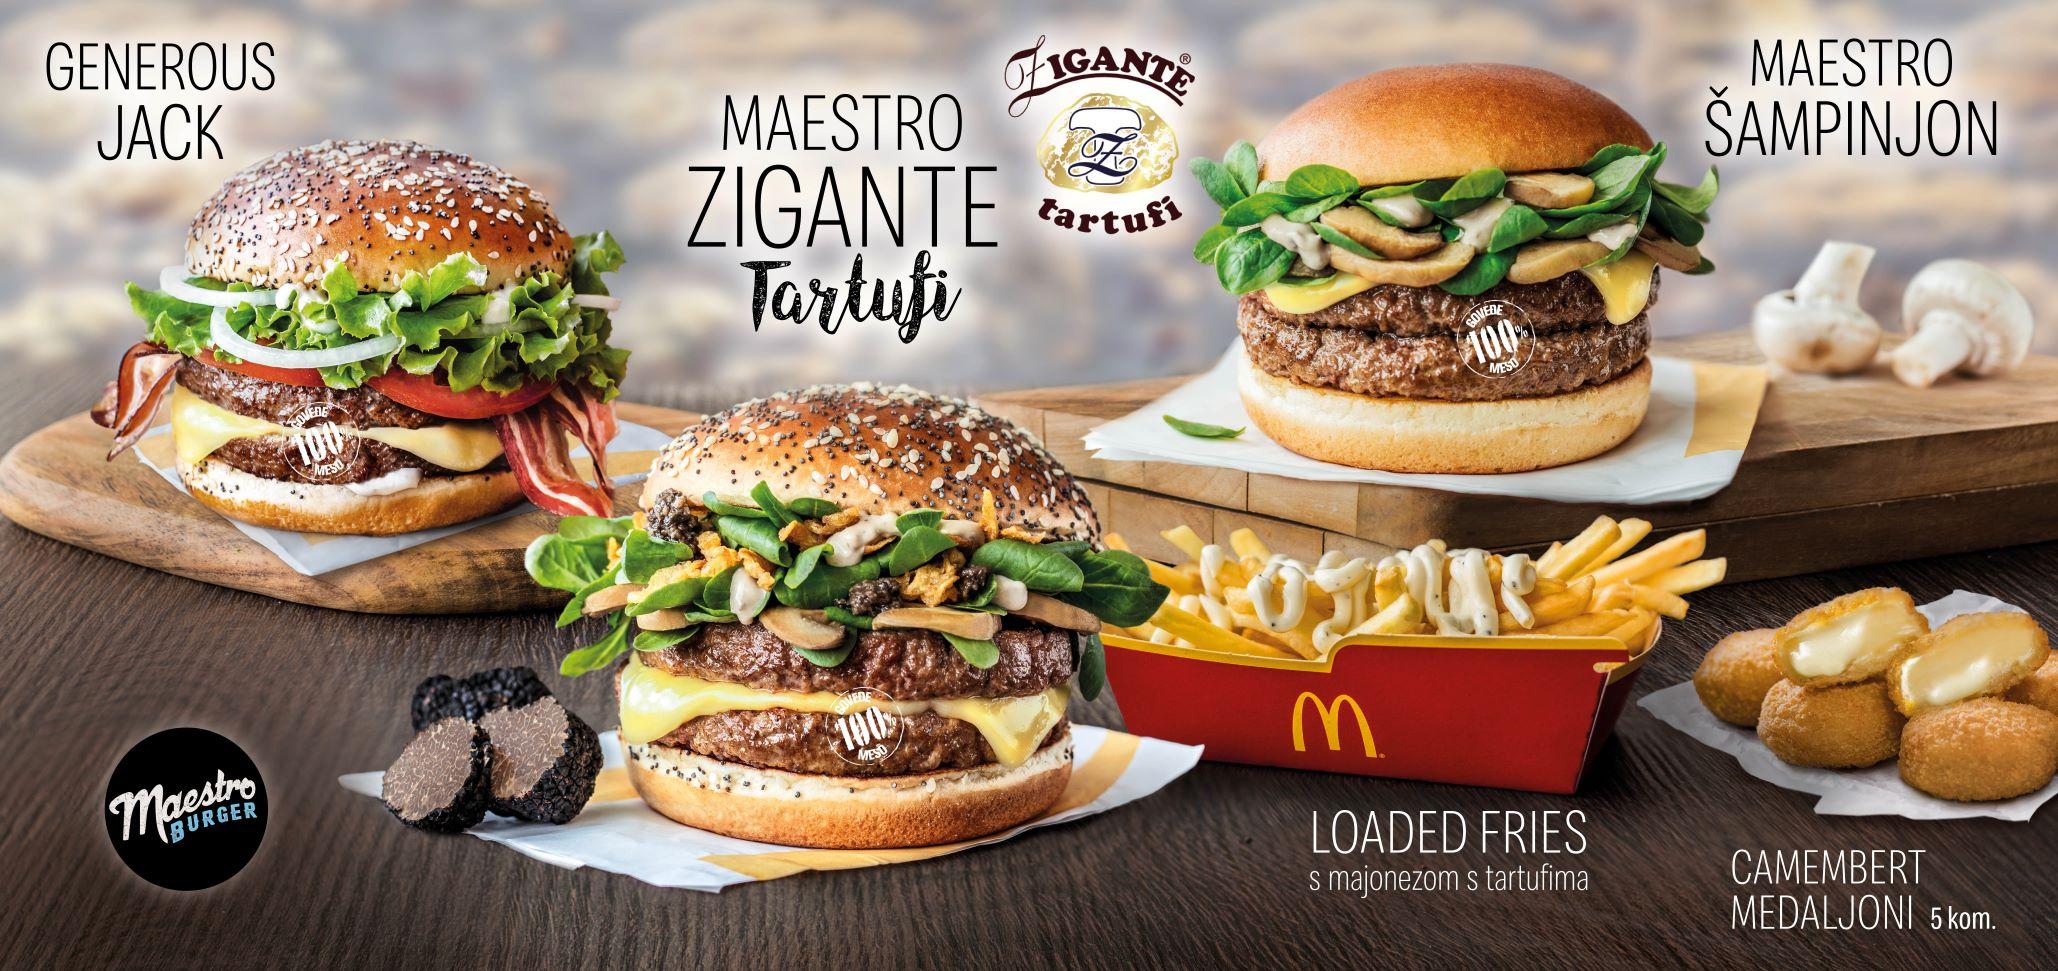 McDonald's Maestro Zigante Tartufi1